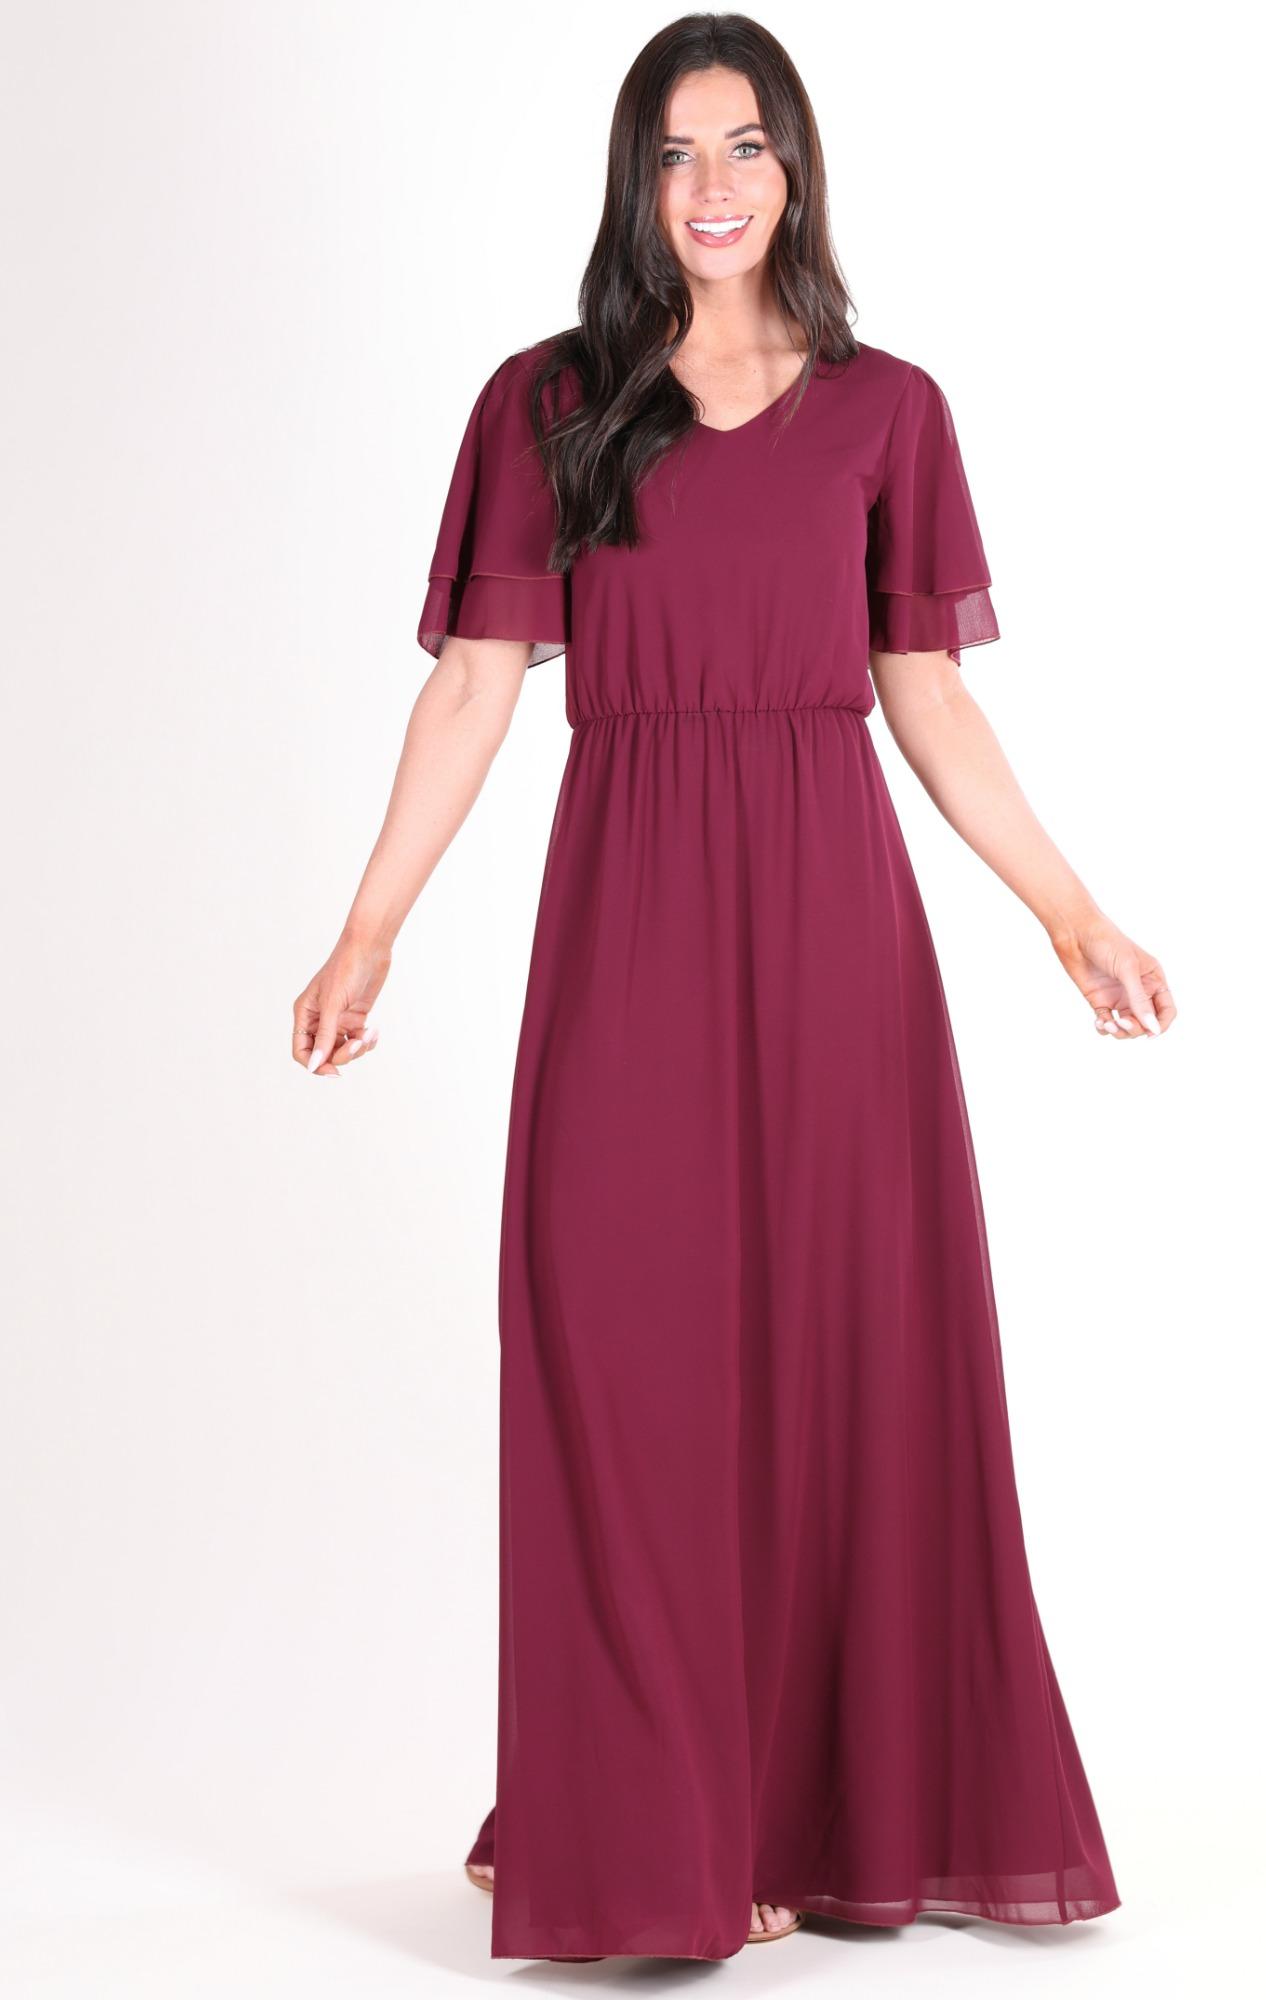 Chloe Chiffon Maxi Dress-Burgundy